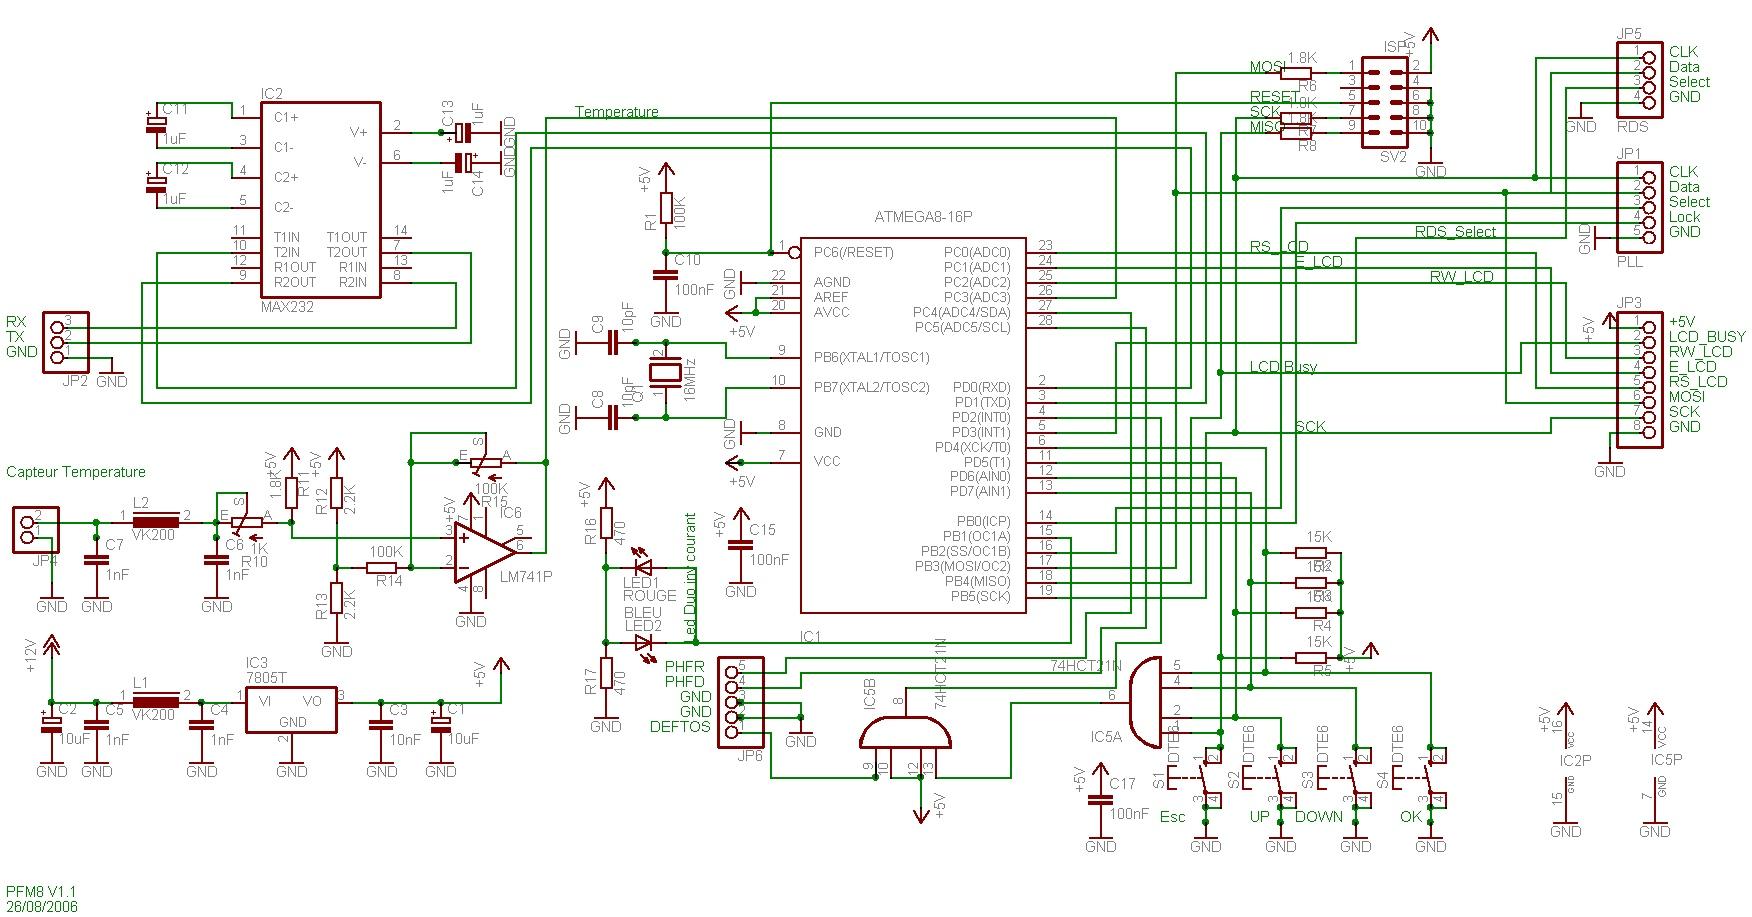 atmega8 circuit diagram sw 5587  avr atmega8 board for pll mc145170 free diagram  avr atmega8 board for pll mc145170 free